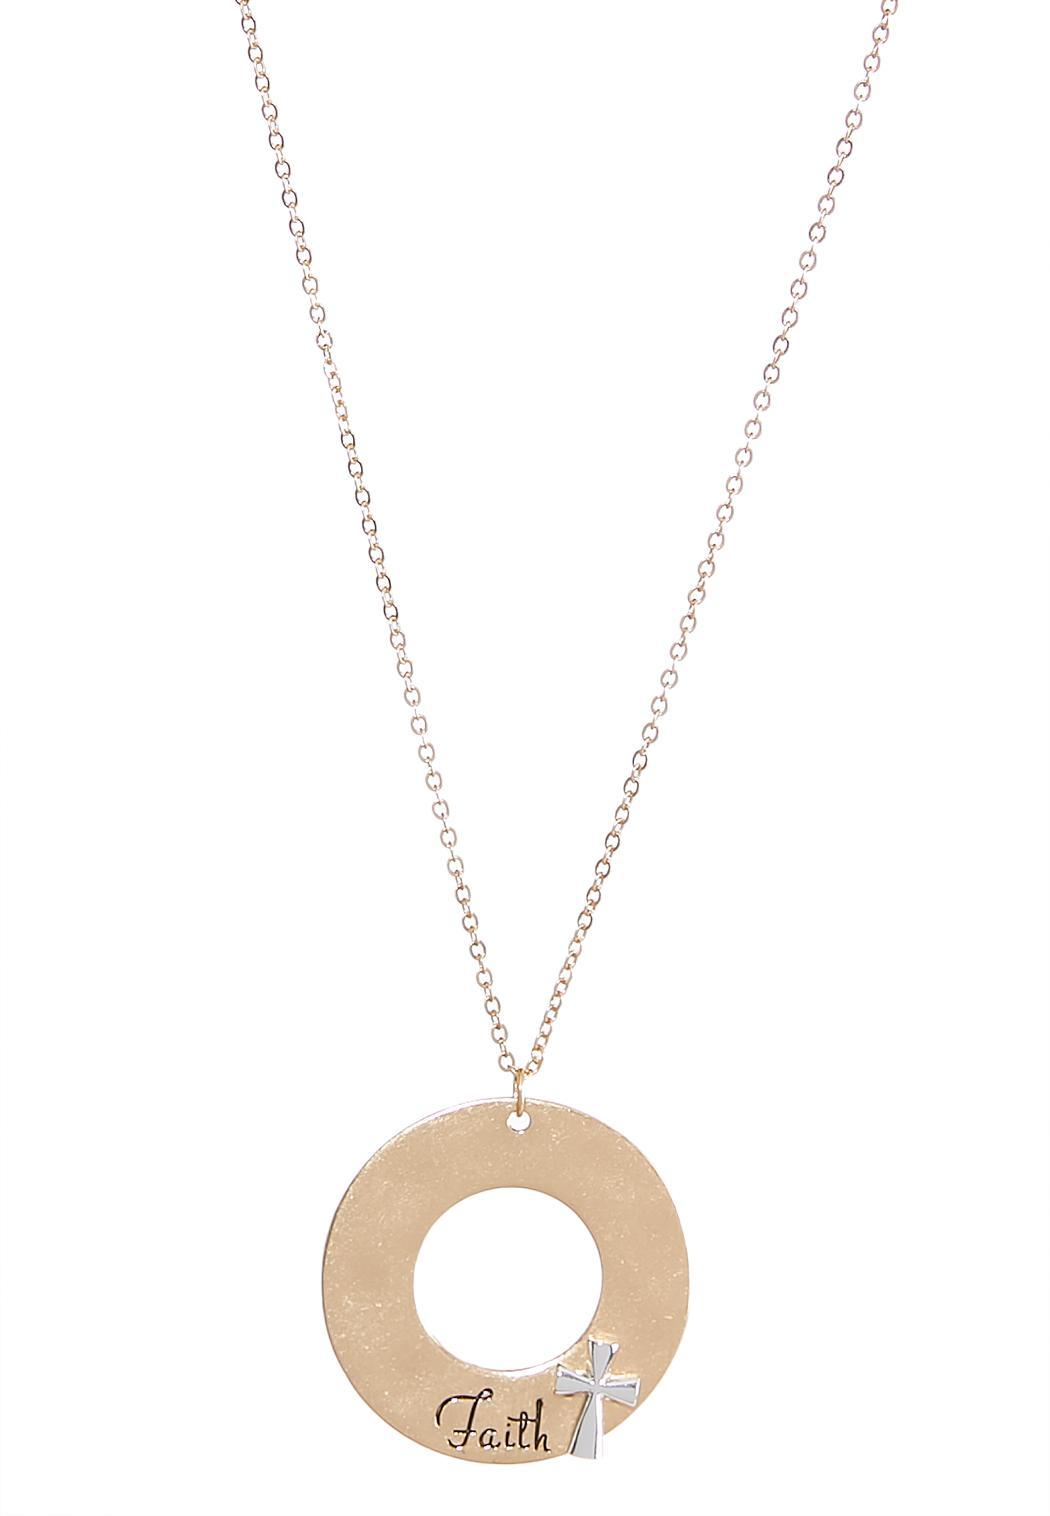 Faith open circle pendant necklace necklaces cato fashions faith open circle pendant necklace aloadofball Choice Image